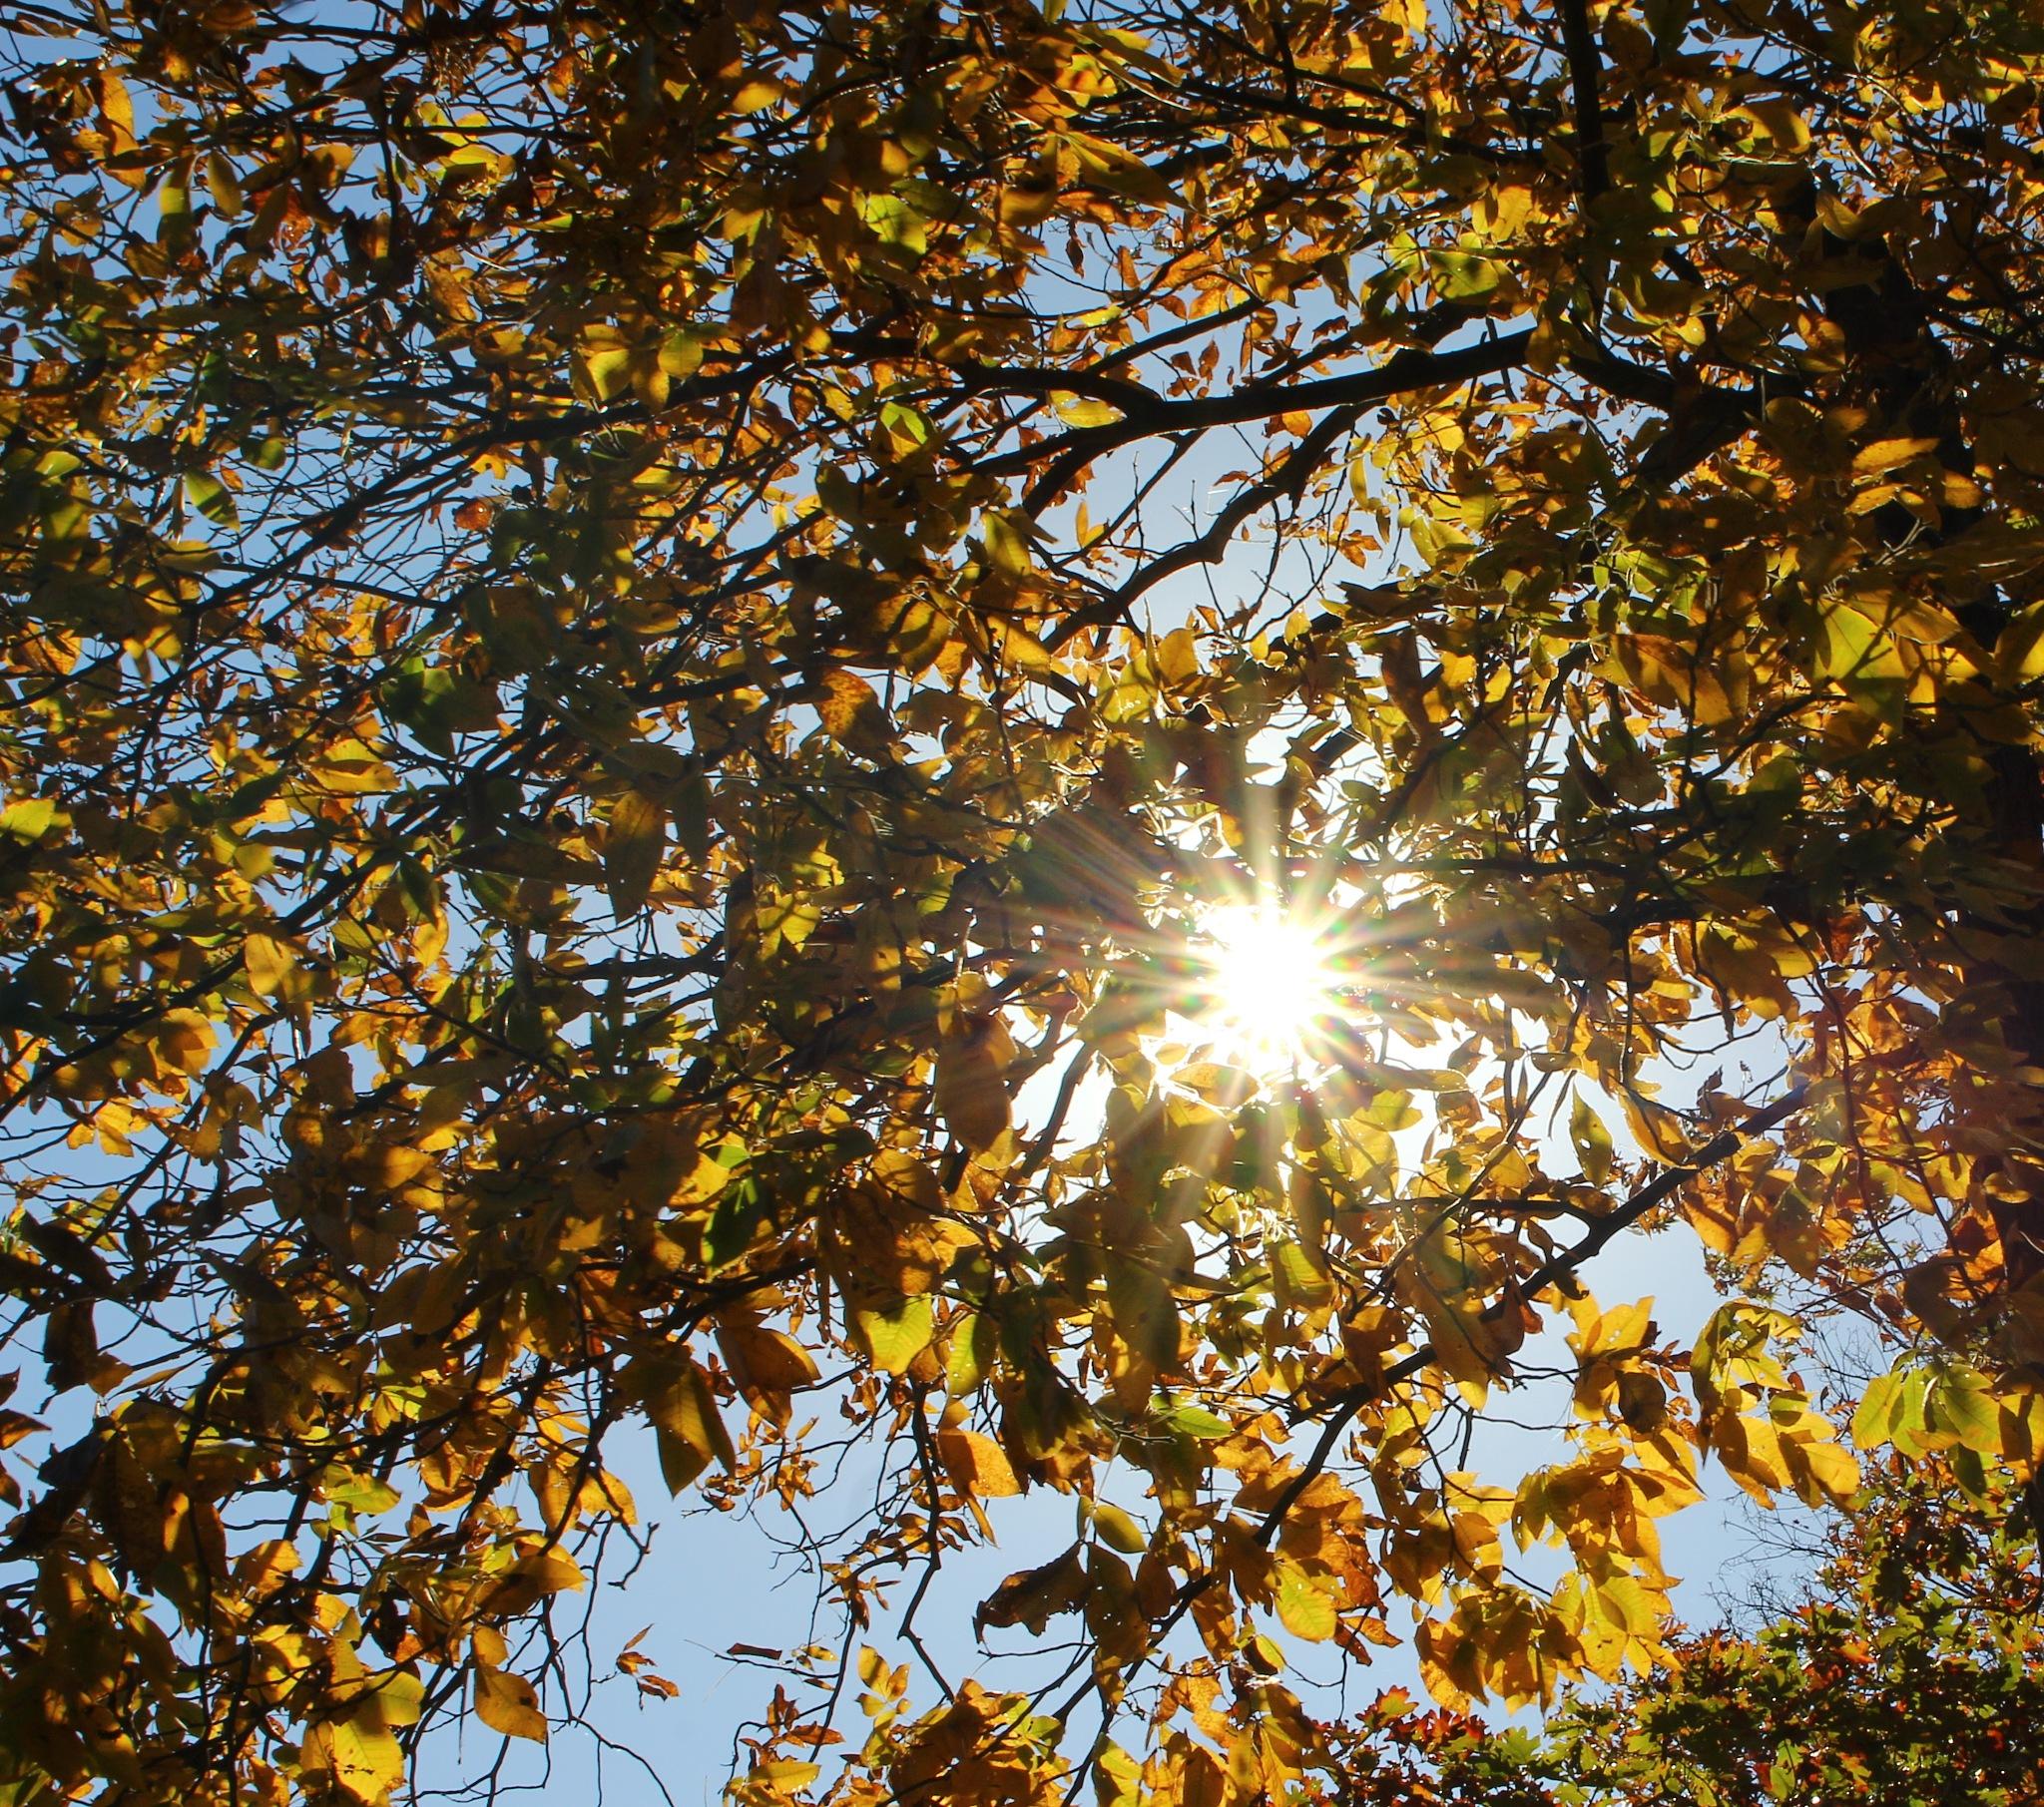 sunbursts by Jim